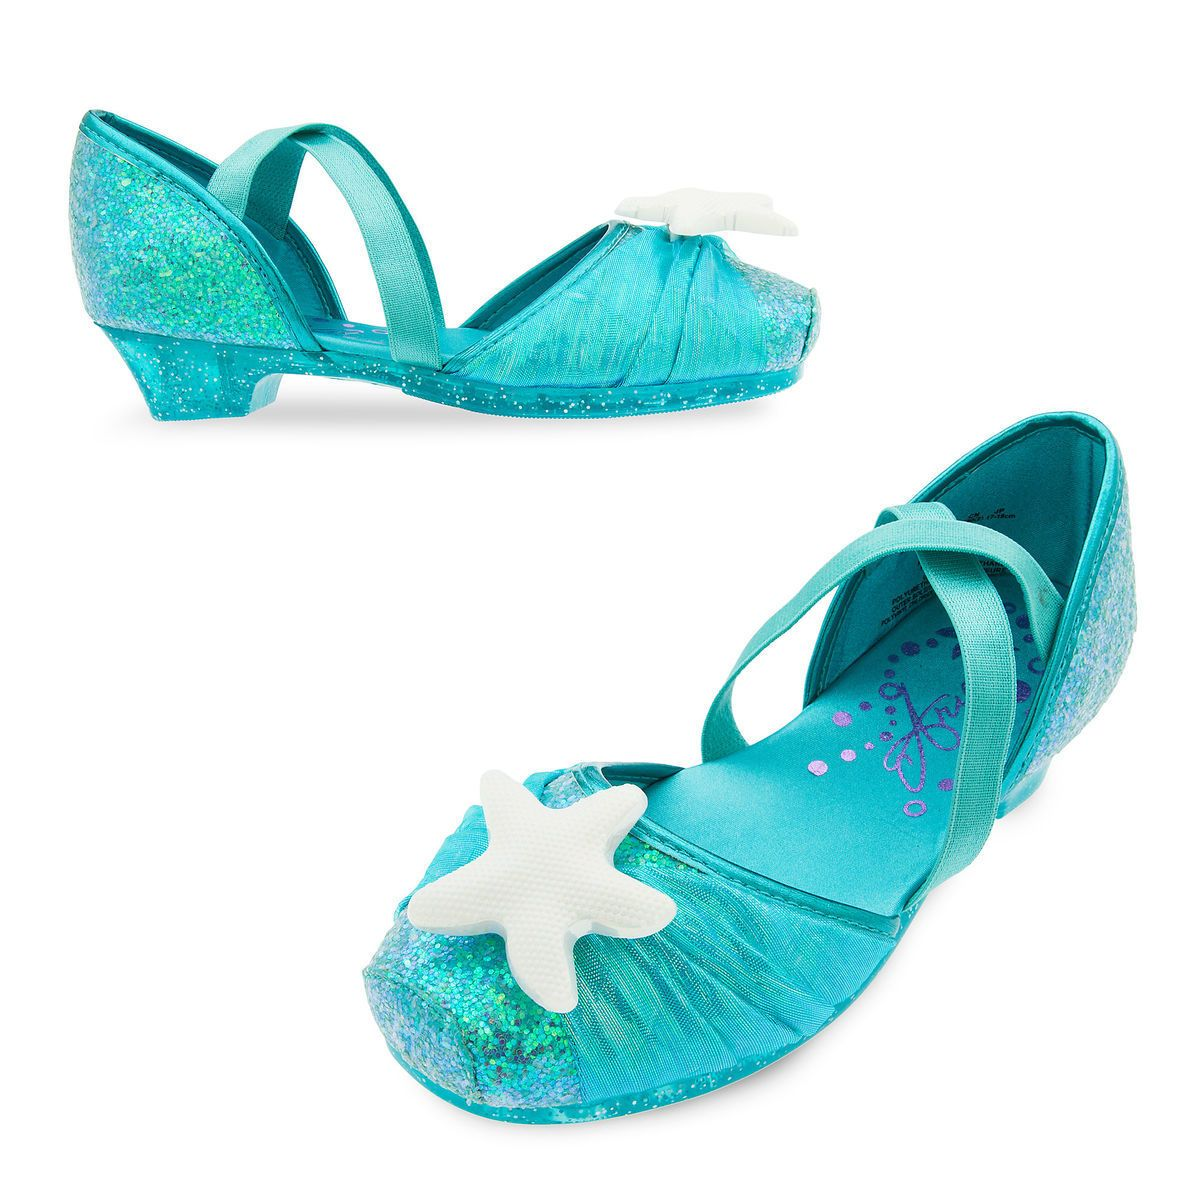 Ariel Costume Shoes for Kids | Mermaid